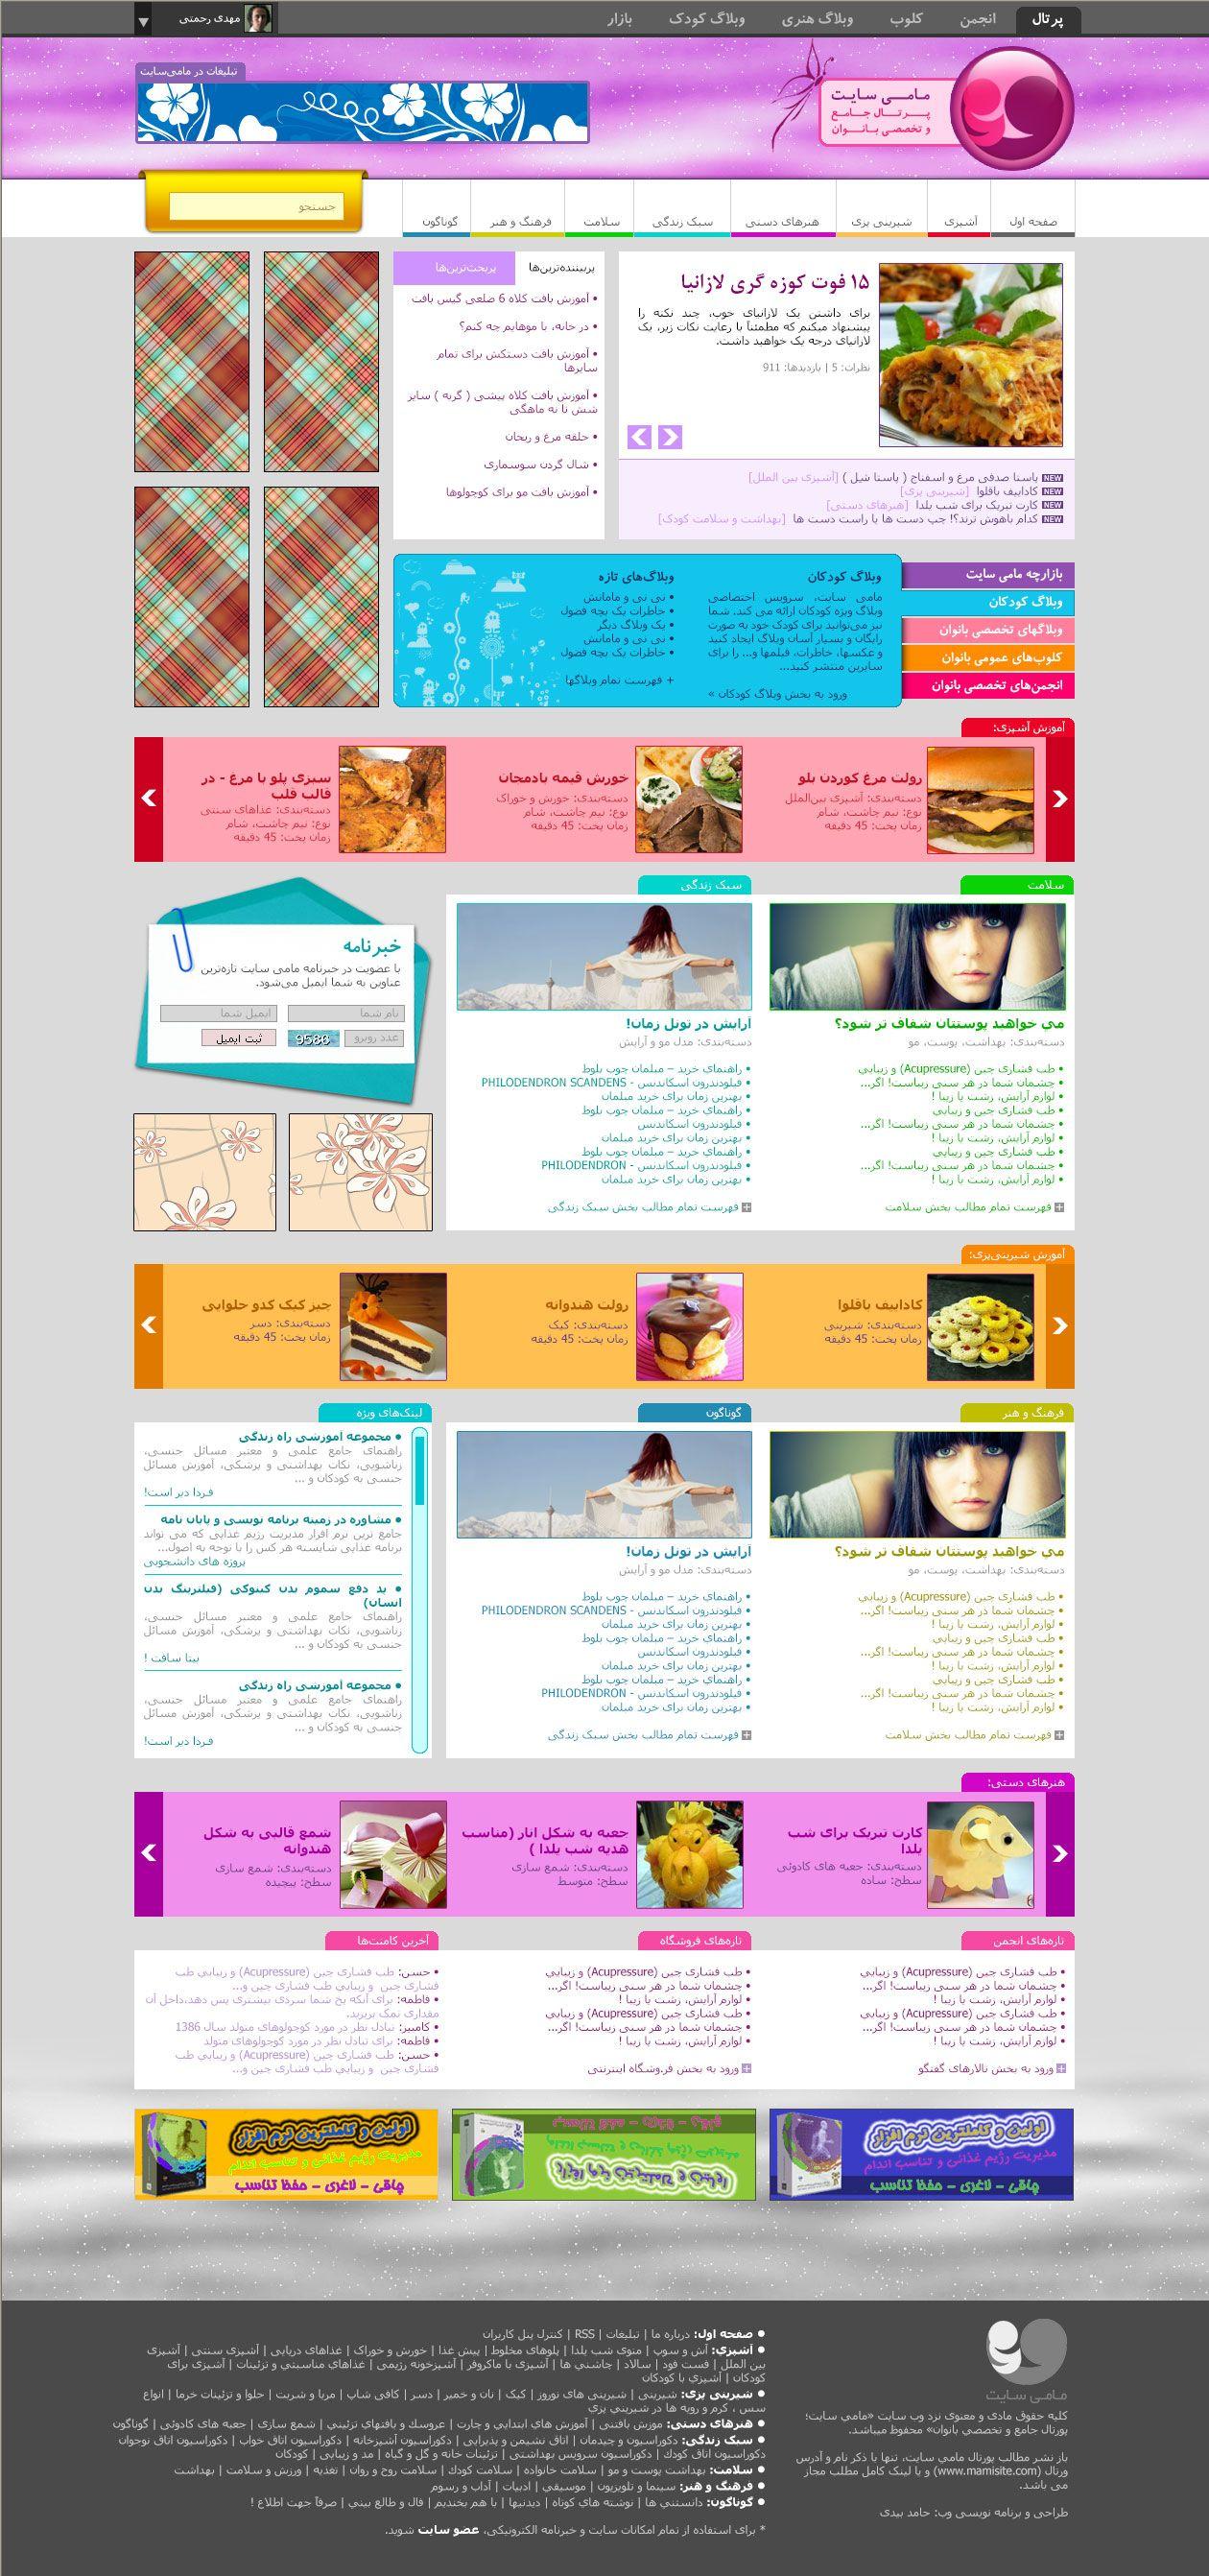 Mamisite web design طراحی وبسایت مامی سایت